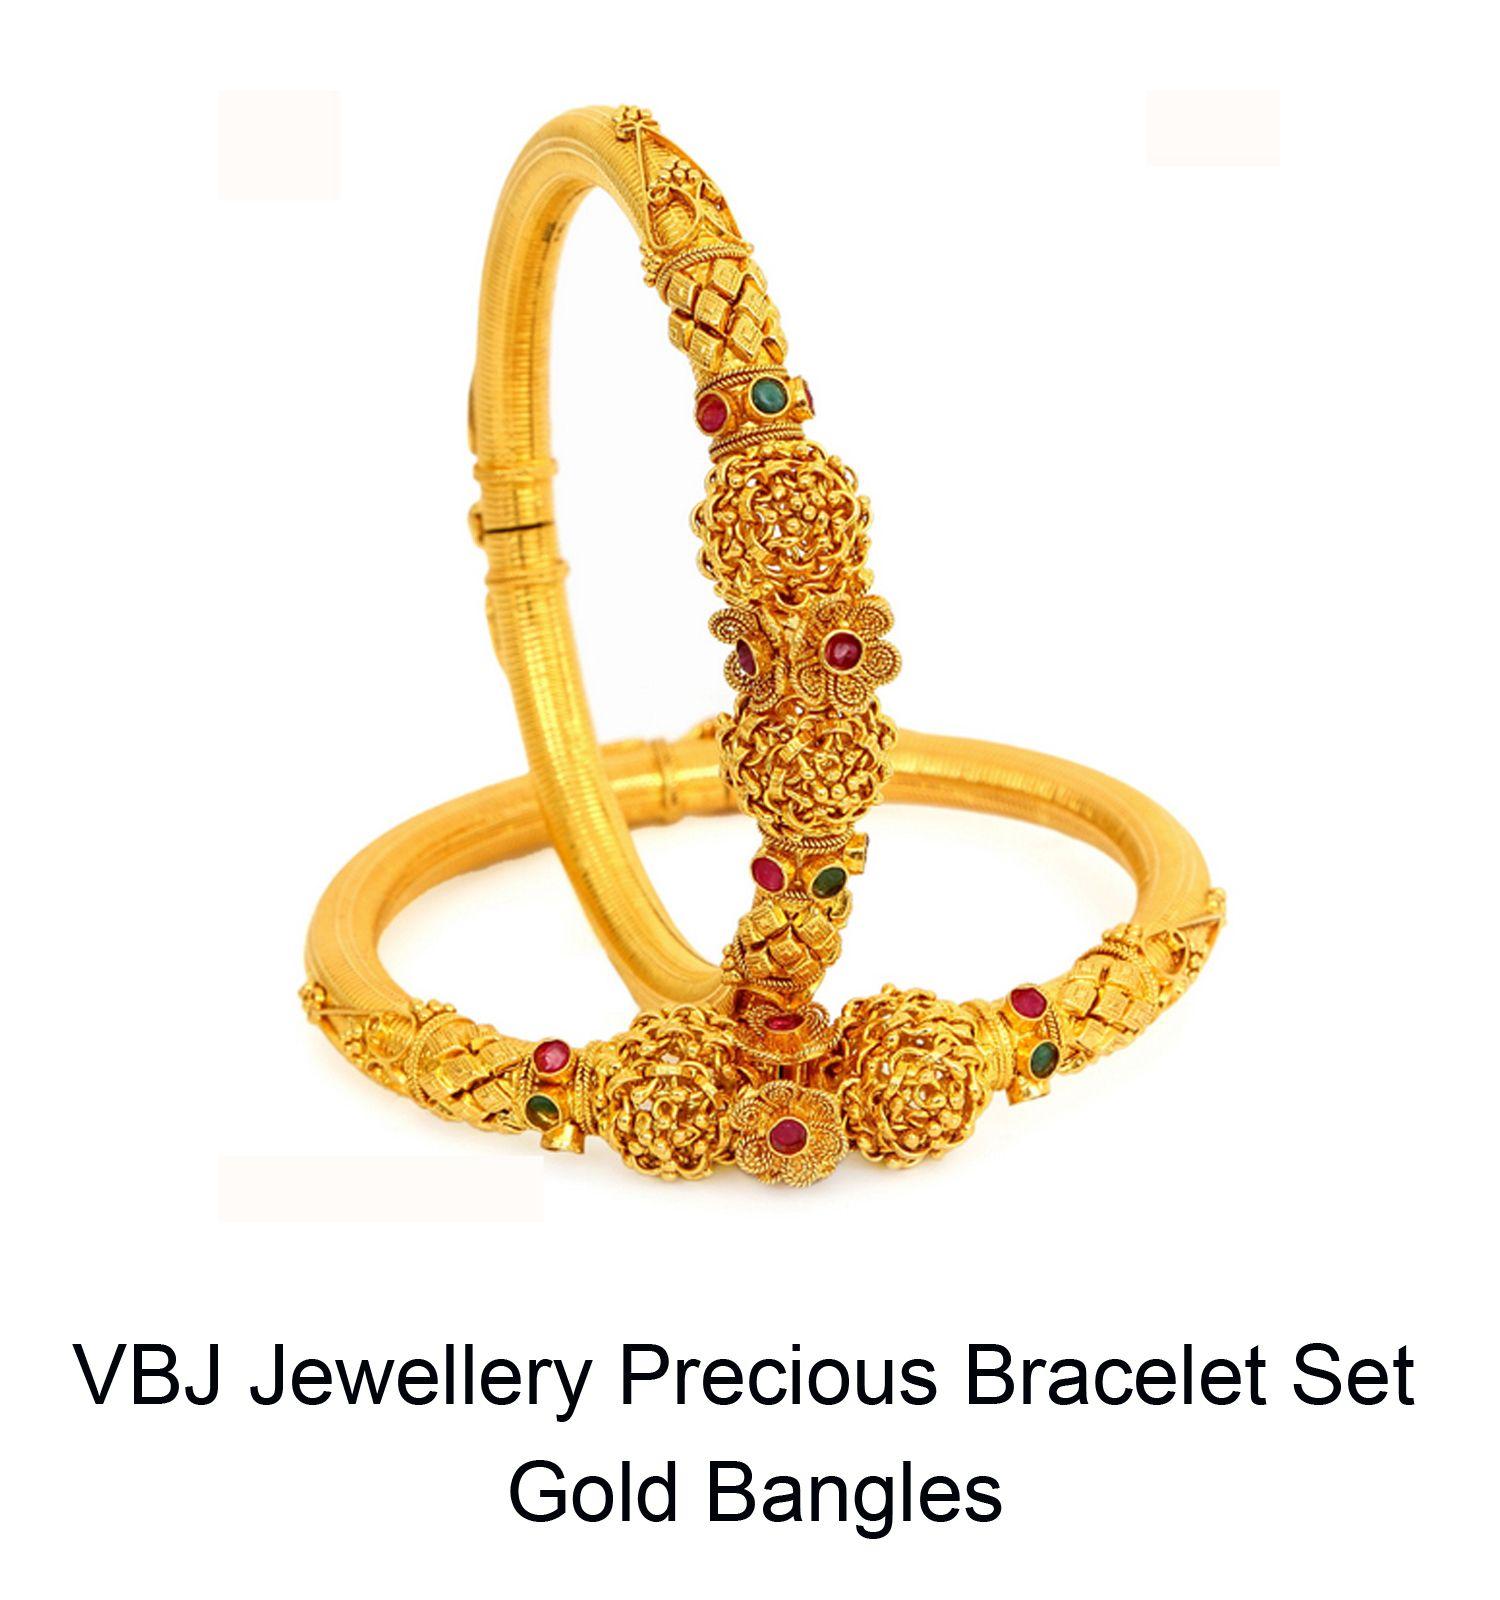 VBJ-Jewellery-Precious-Bracelet-Set-Gold-Bangles-Best-Price-Offer ...